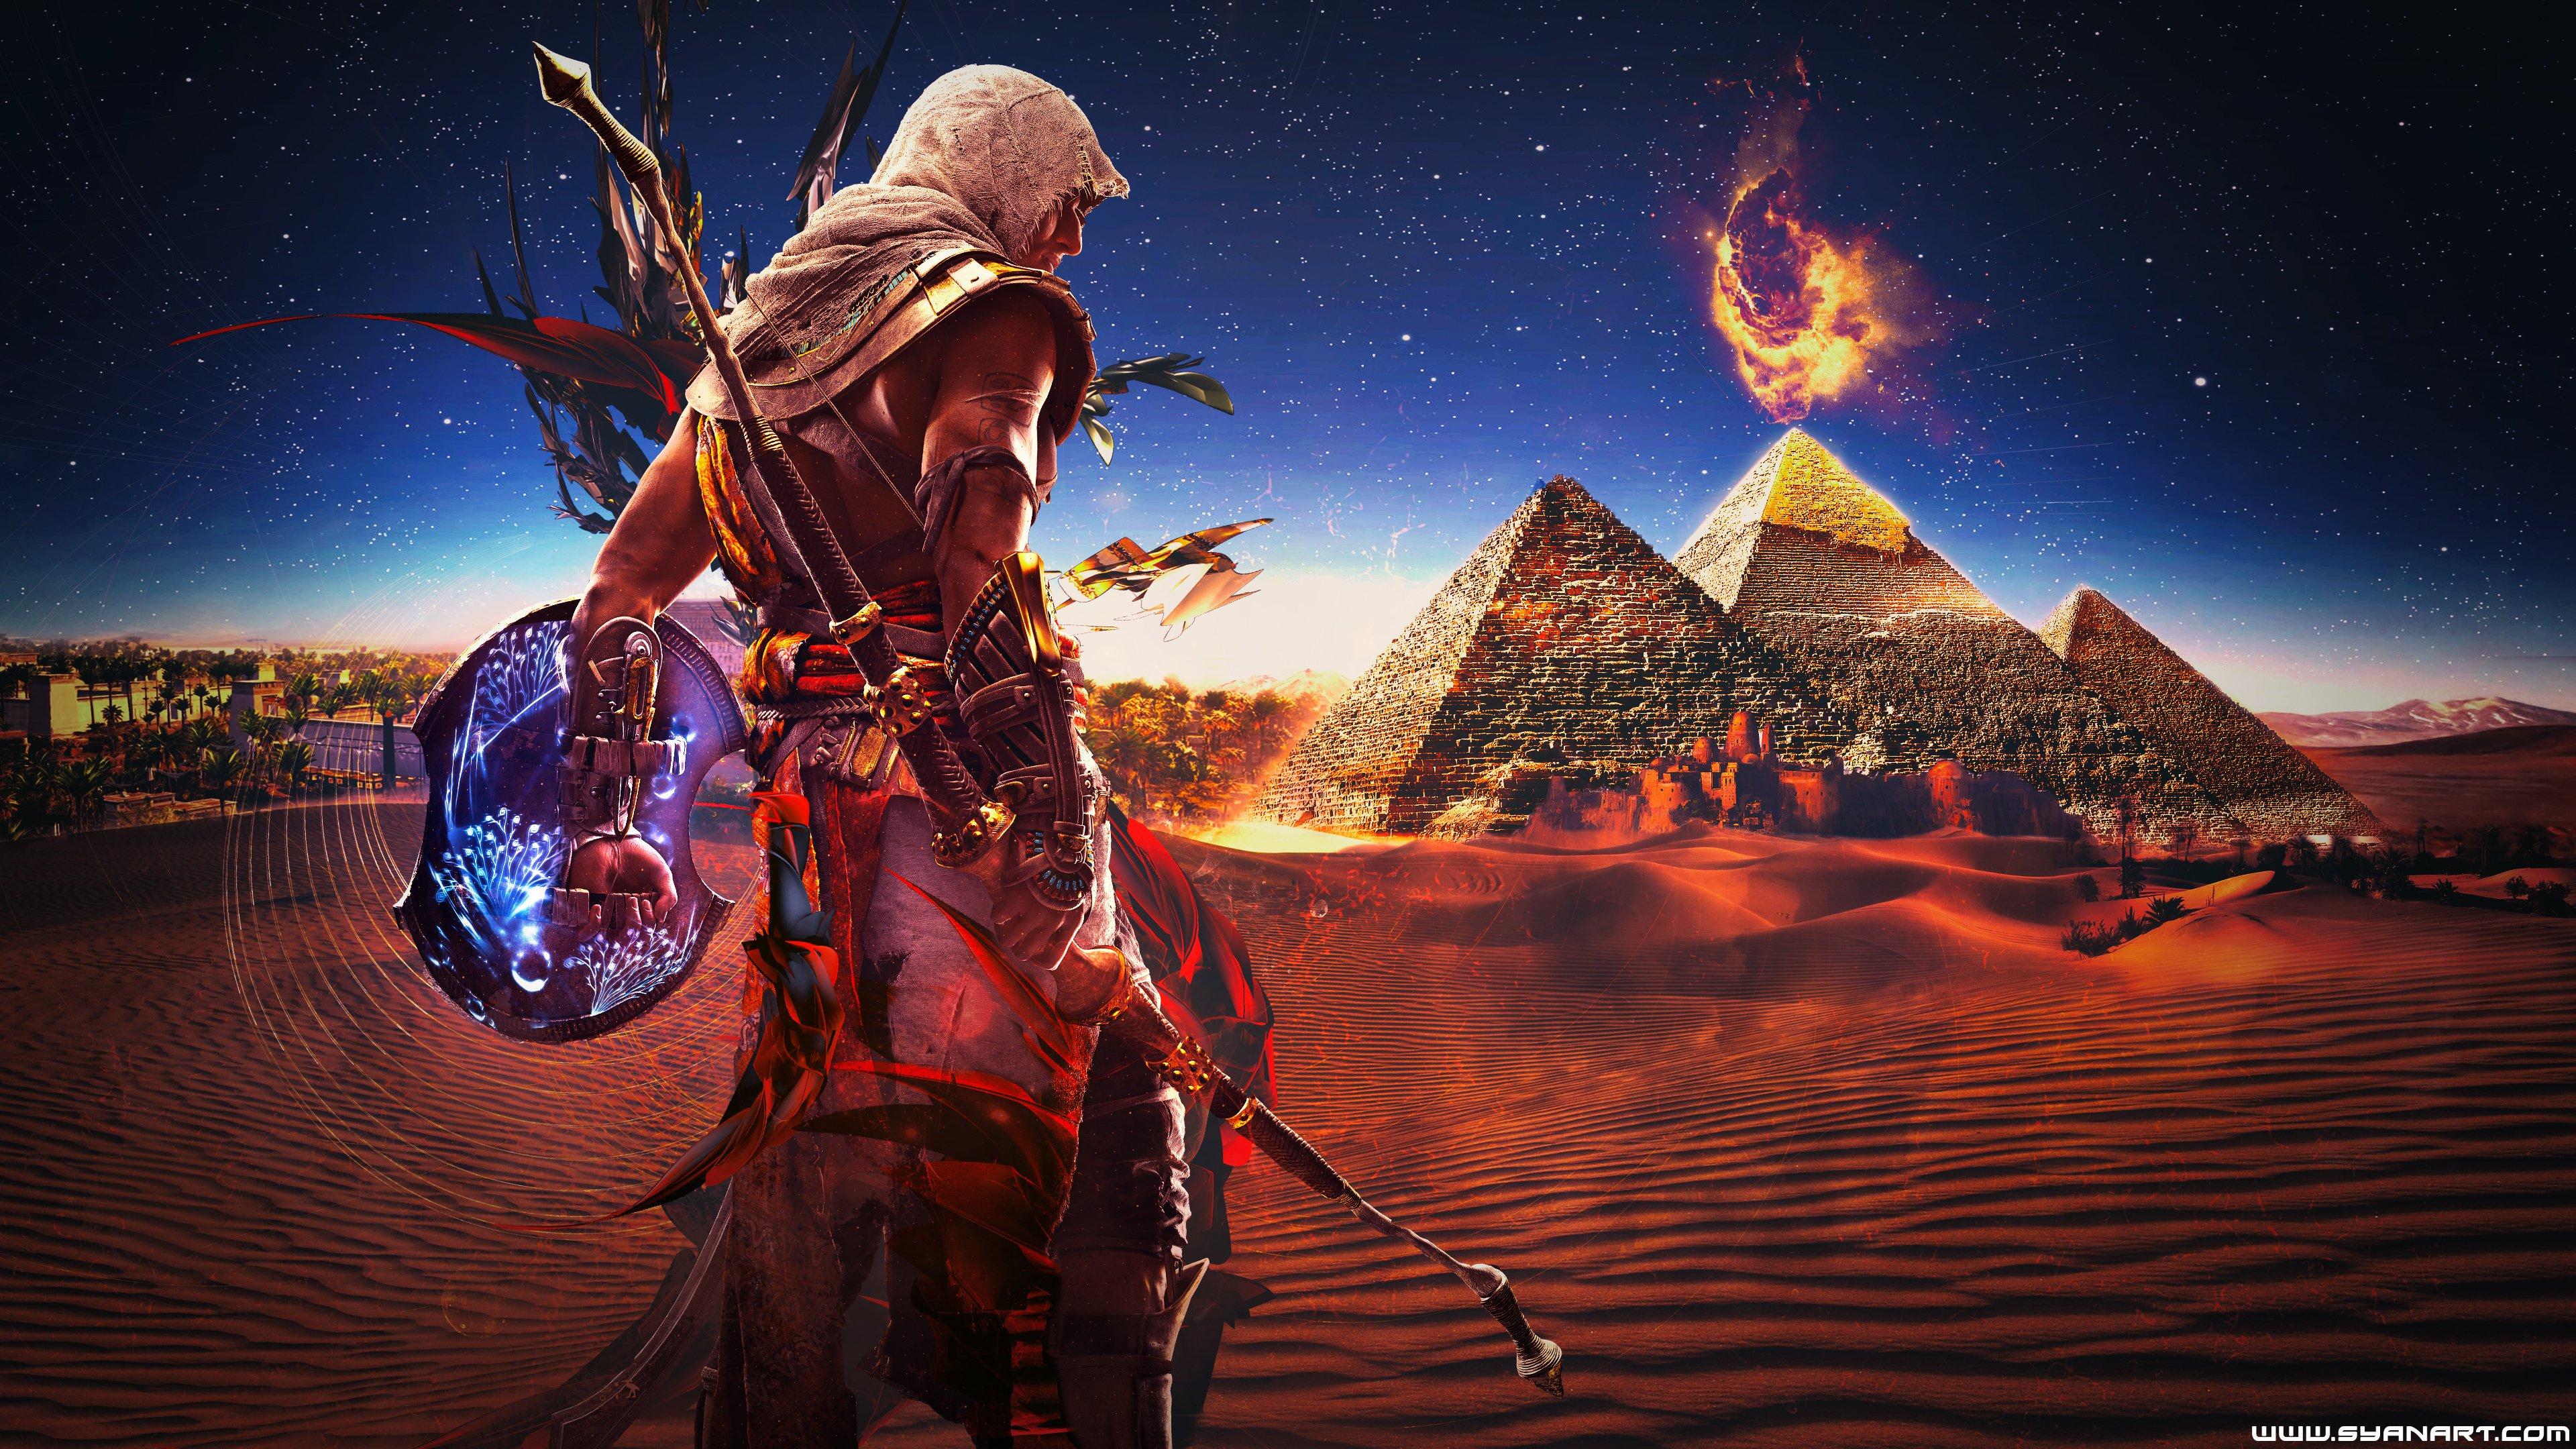 Wallpaper 3840x2160 Px Assassins Creed Fan Art Pyramid Video Games 3840x2160 Wallbase 1341811 Hd Wallpapers Wallhere